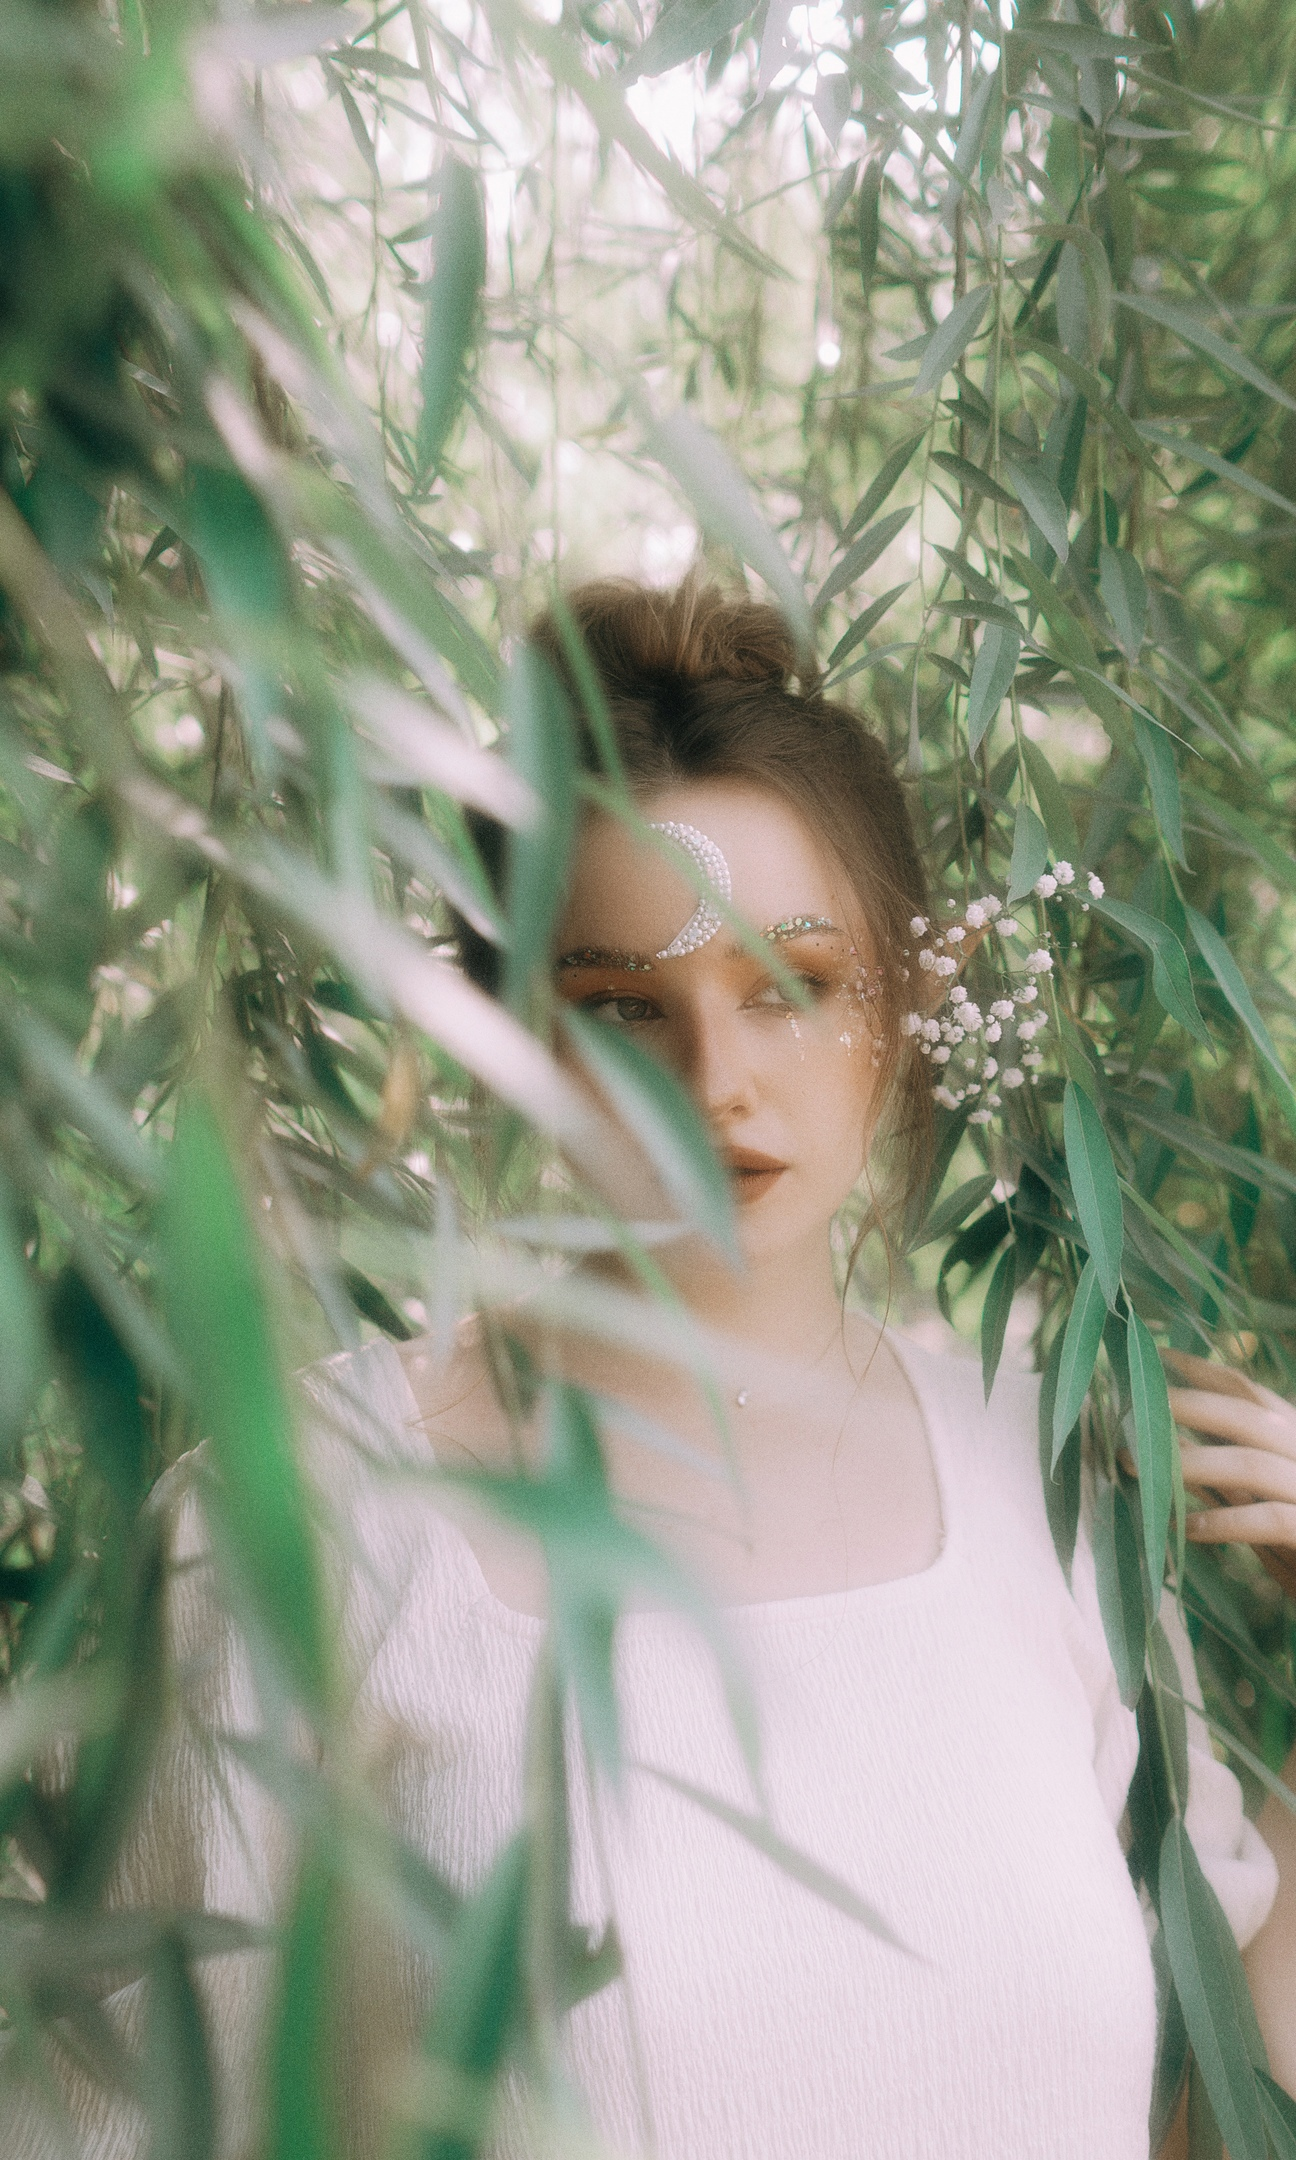 https://www.youngfolks.ru/pub/photographer-alena-rotenberg-model-liza-zotikova